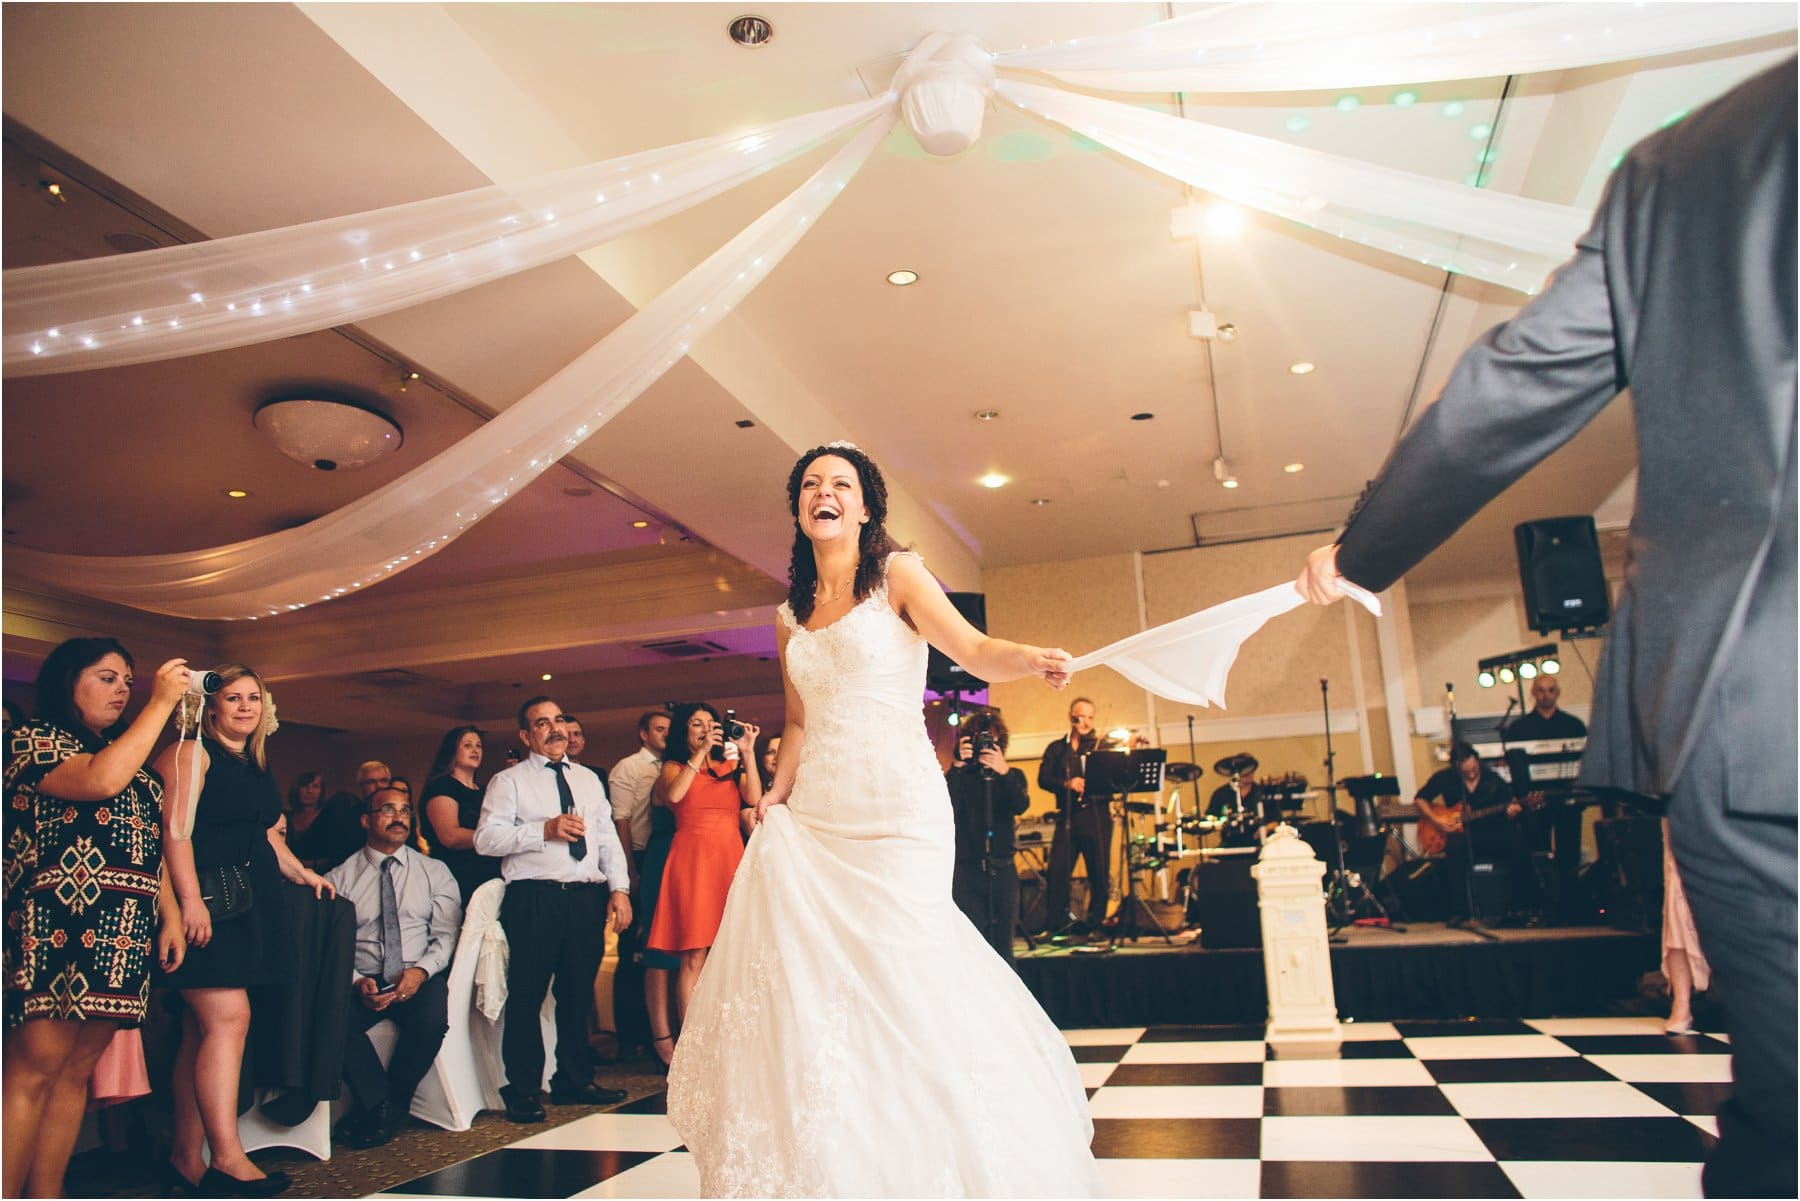 Midland_Manchester_Wedding_Photography_0122